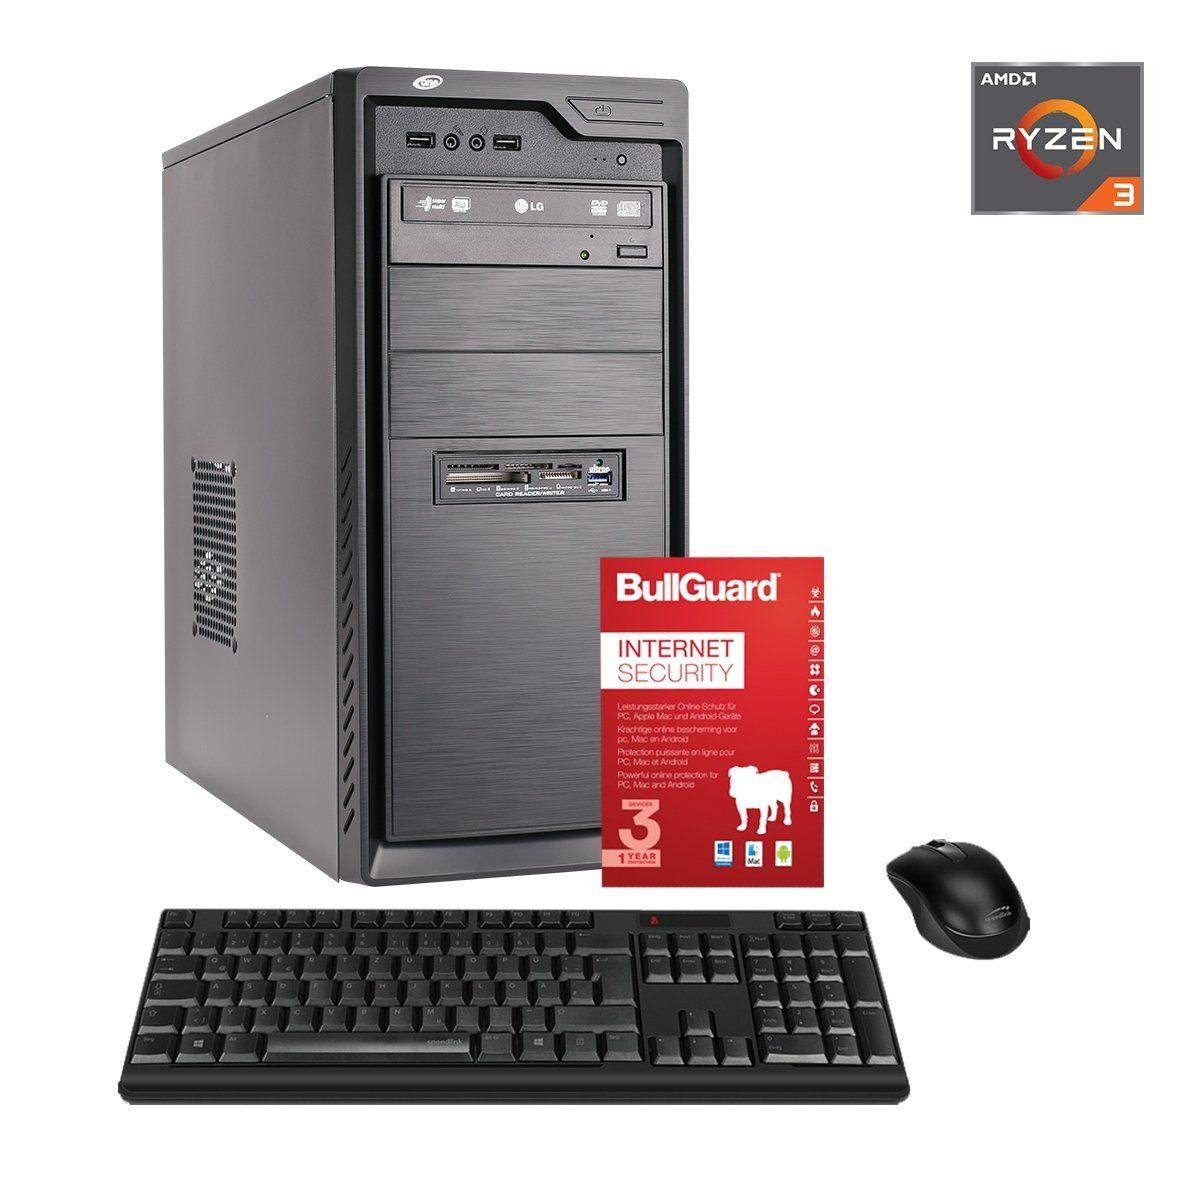 ONE PC, Ryzen 3 2200G, Radeon RX Vega 8 Graphics, 8GB DDR4 RAM »PC 44079«